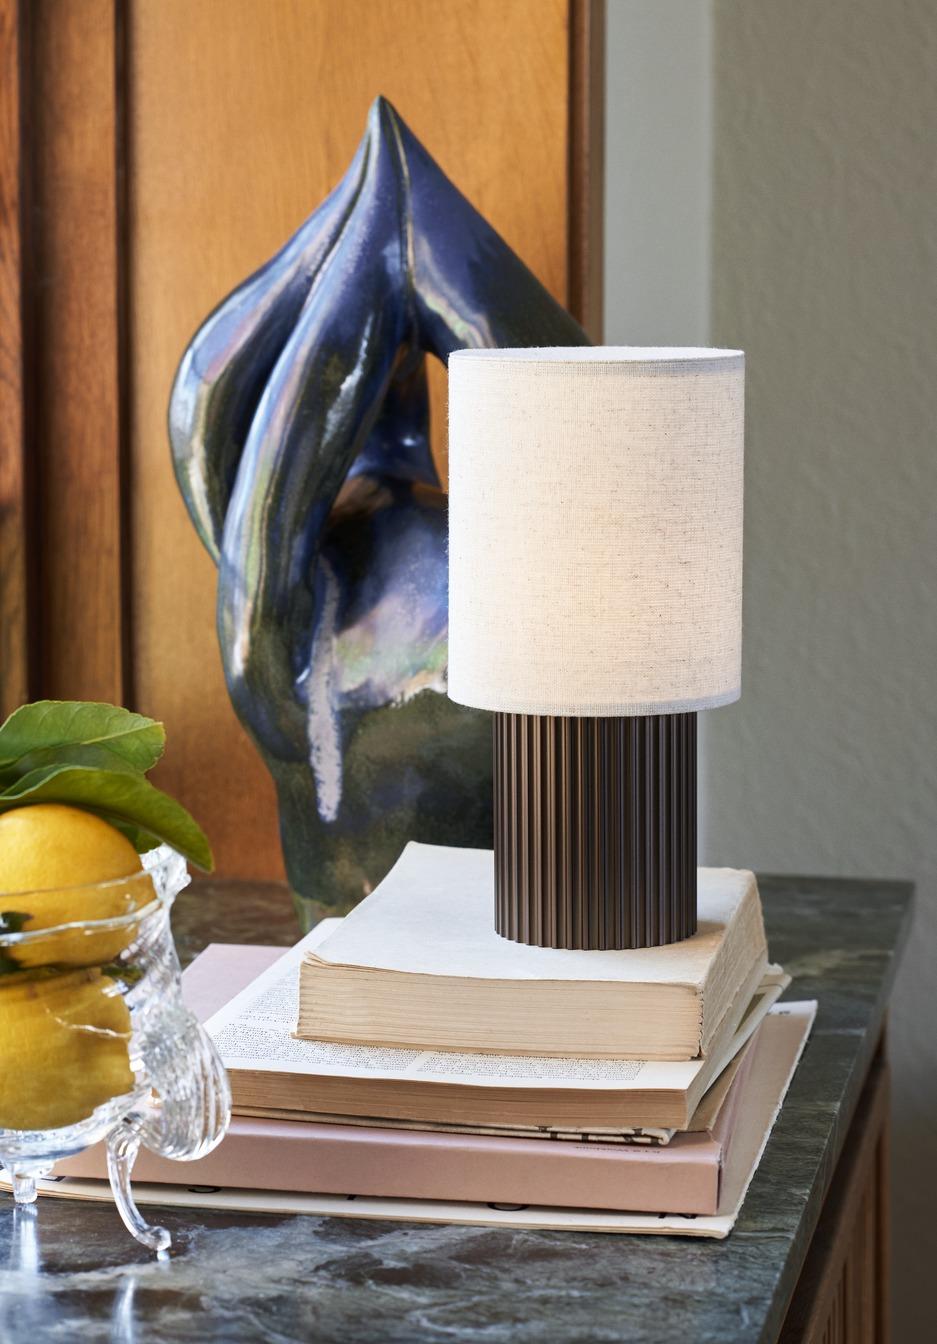 &Tradition Manhattan SC52 Portable Lamp Canvas